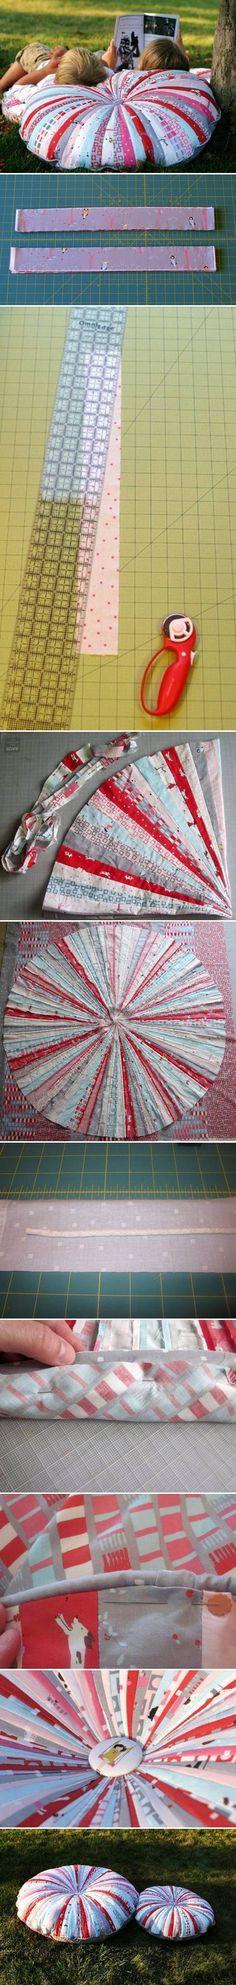 DIY Patchwork Round Pillow DIY Projects   UsefulDIY.com